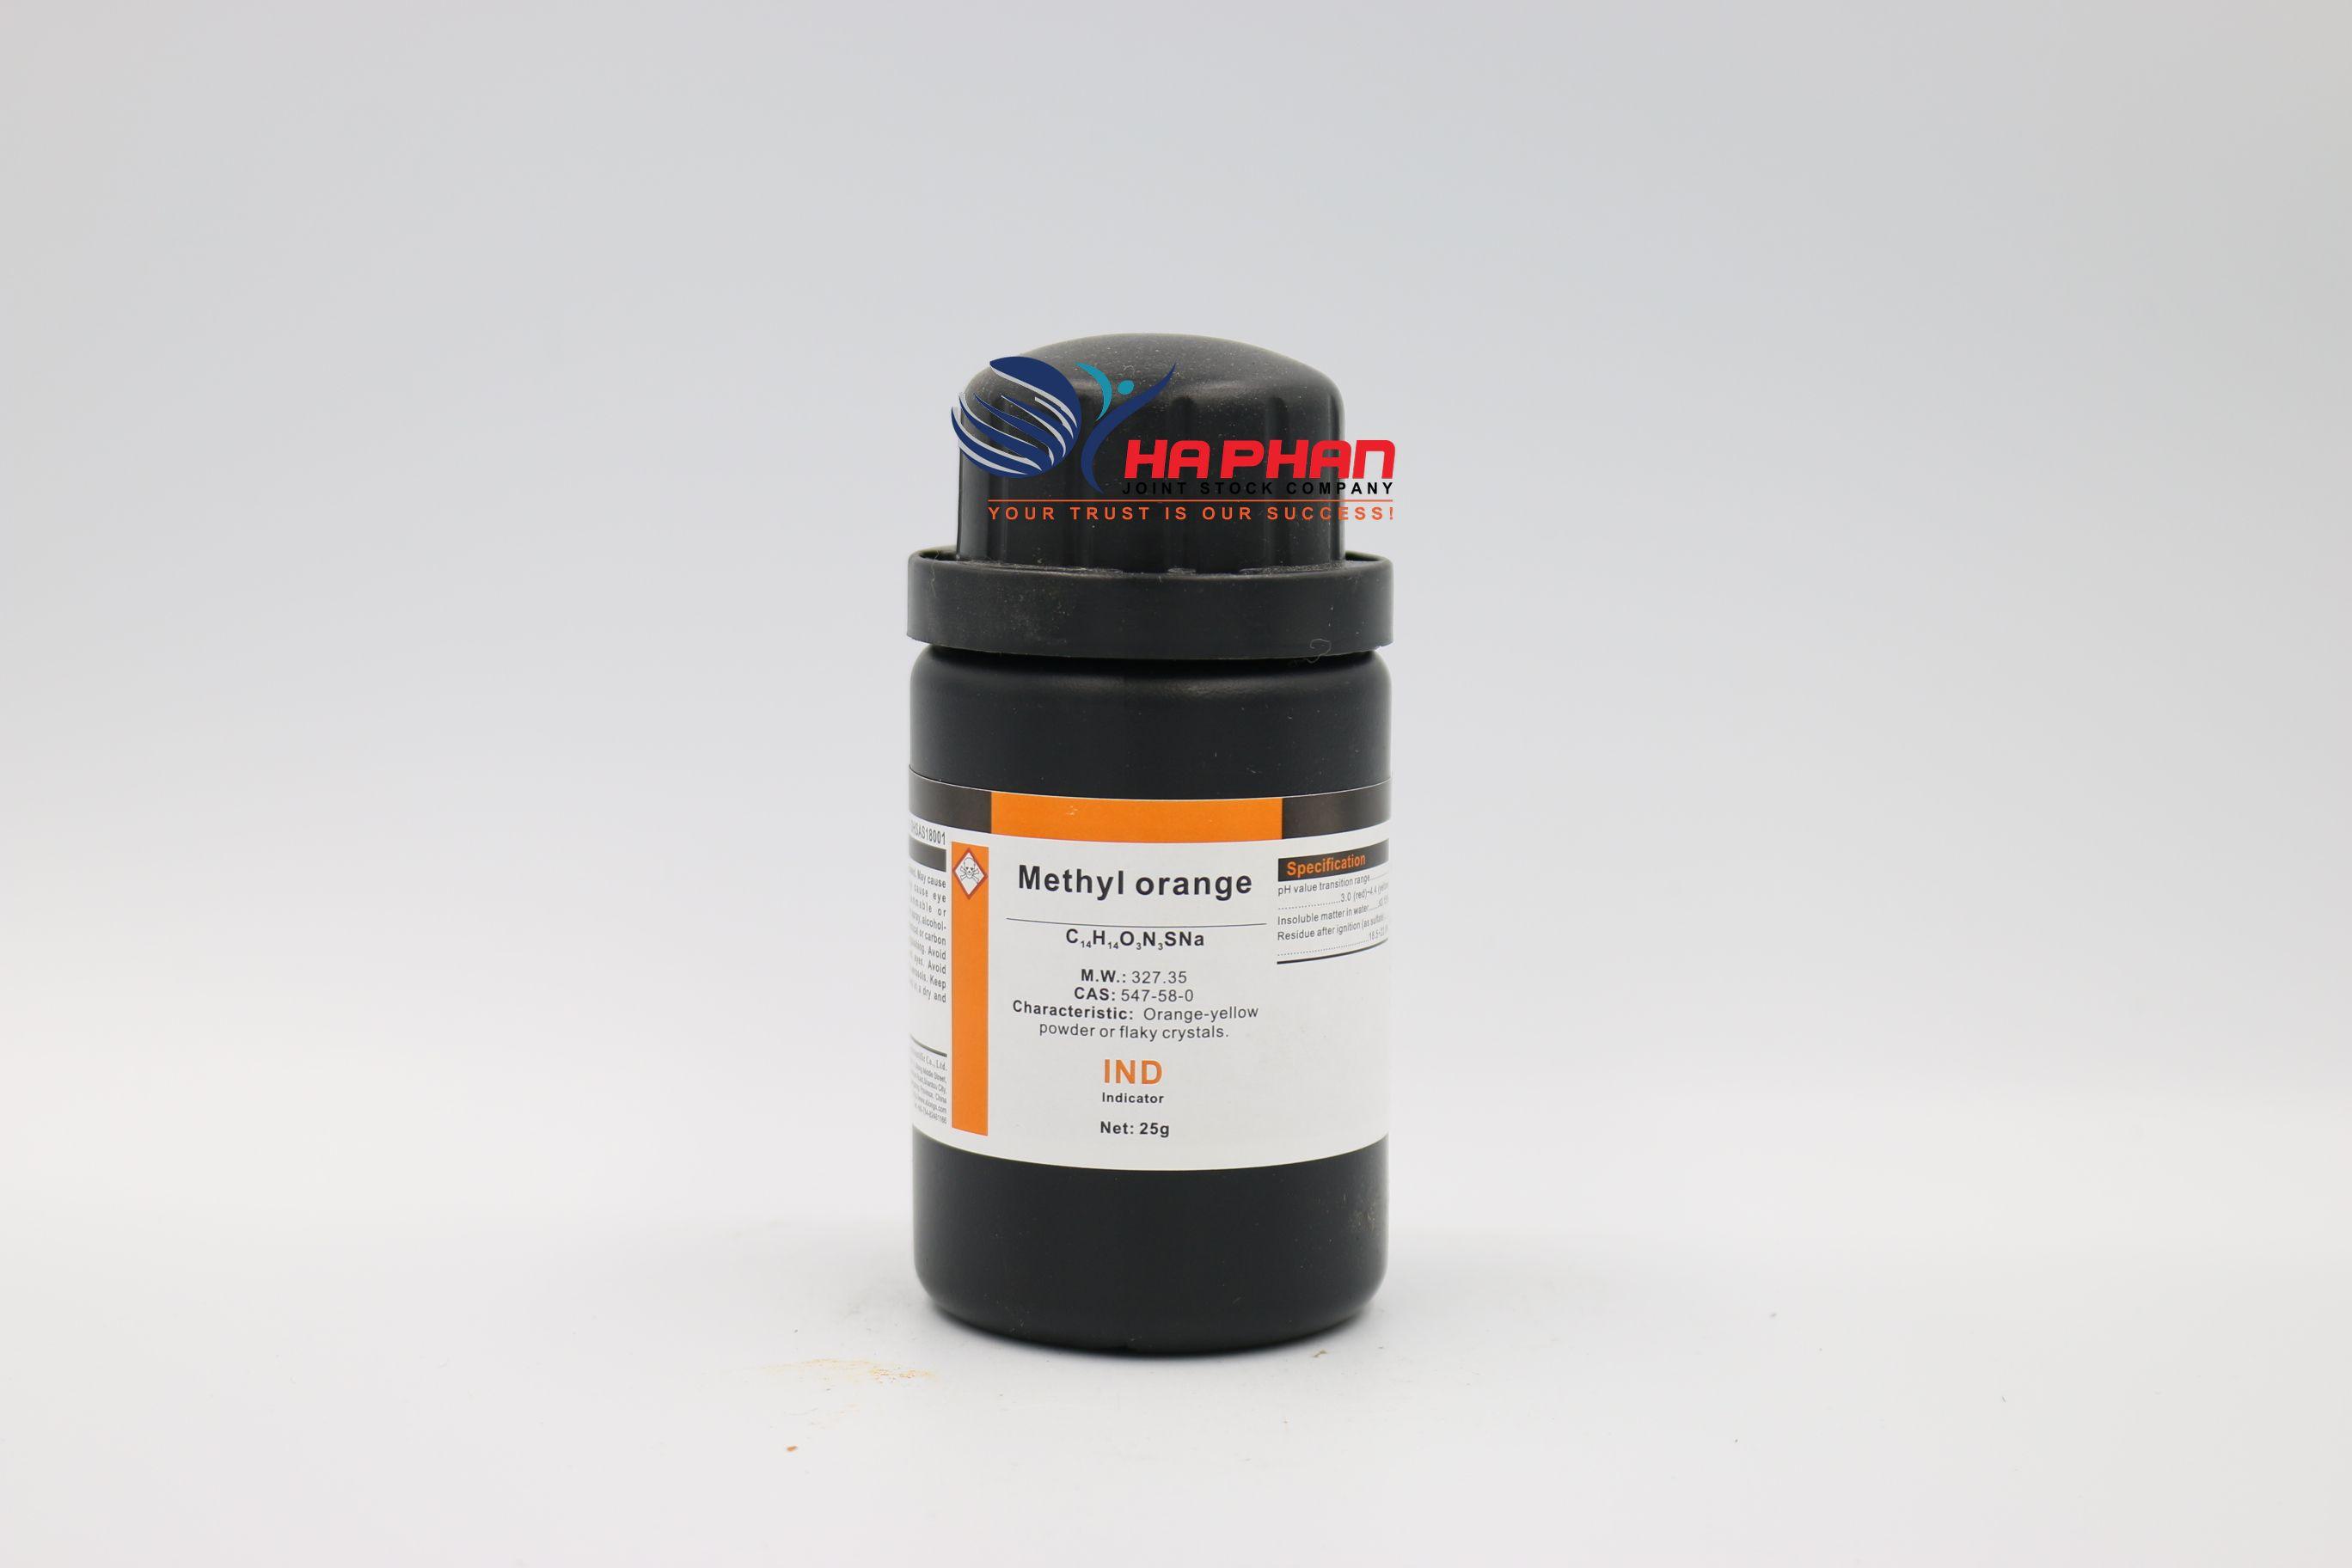 Methyl orange